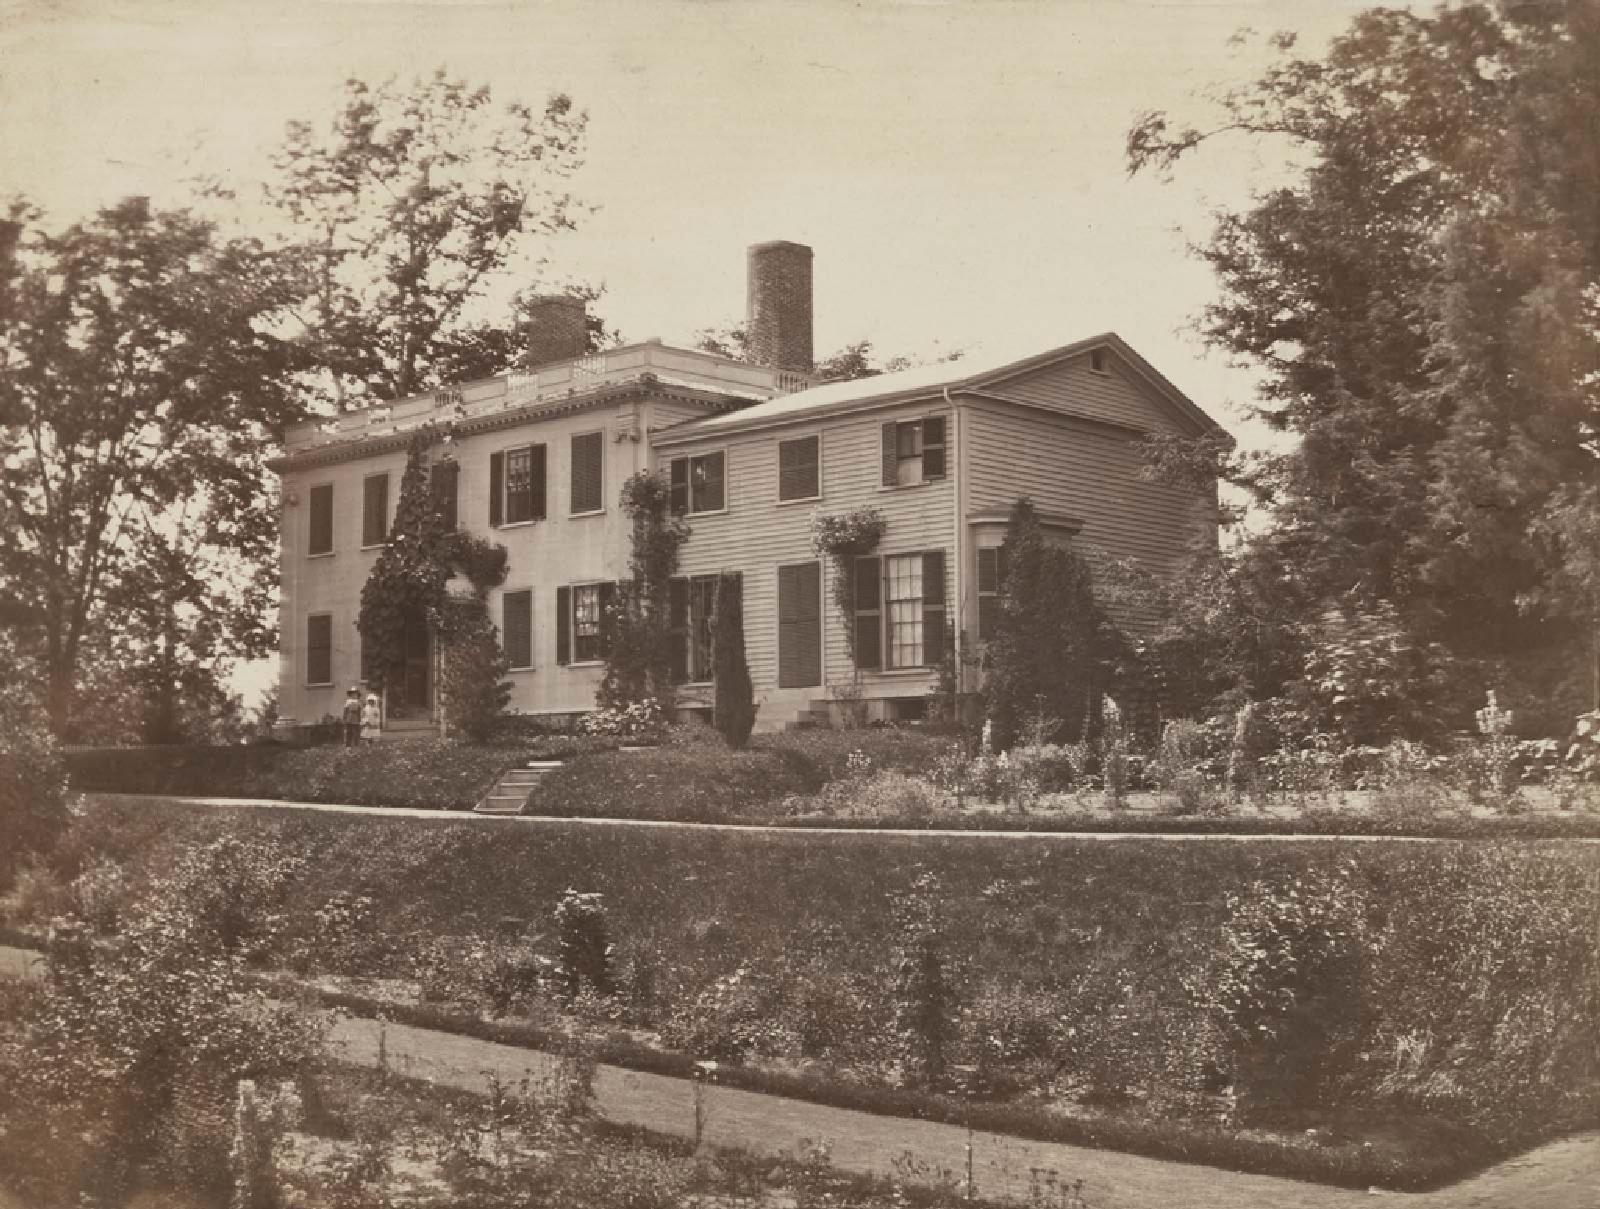 Asa Gray House